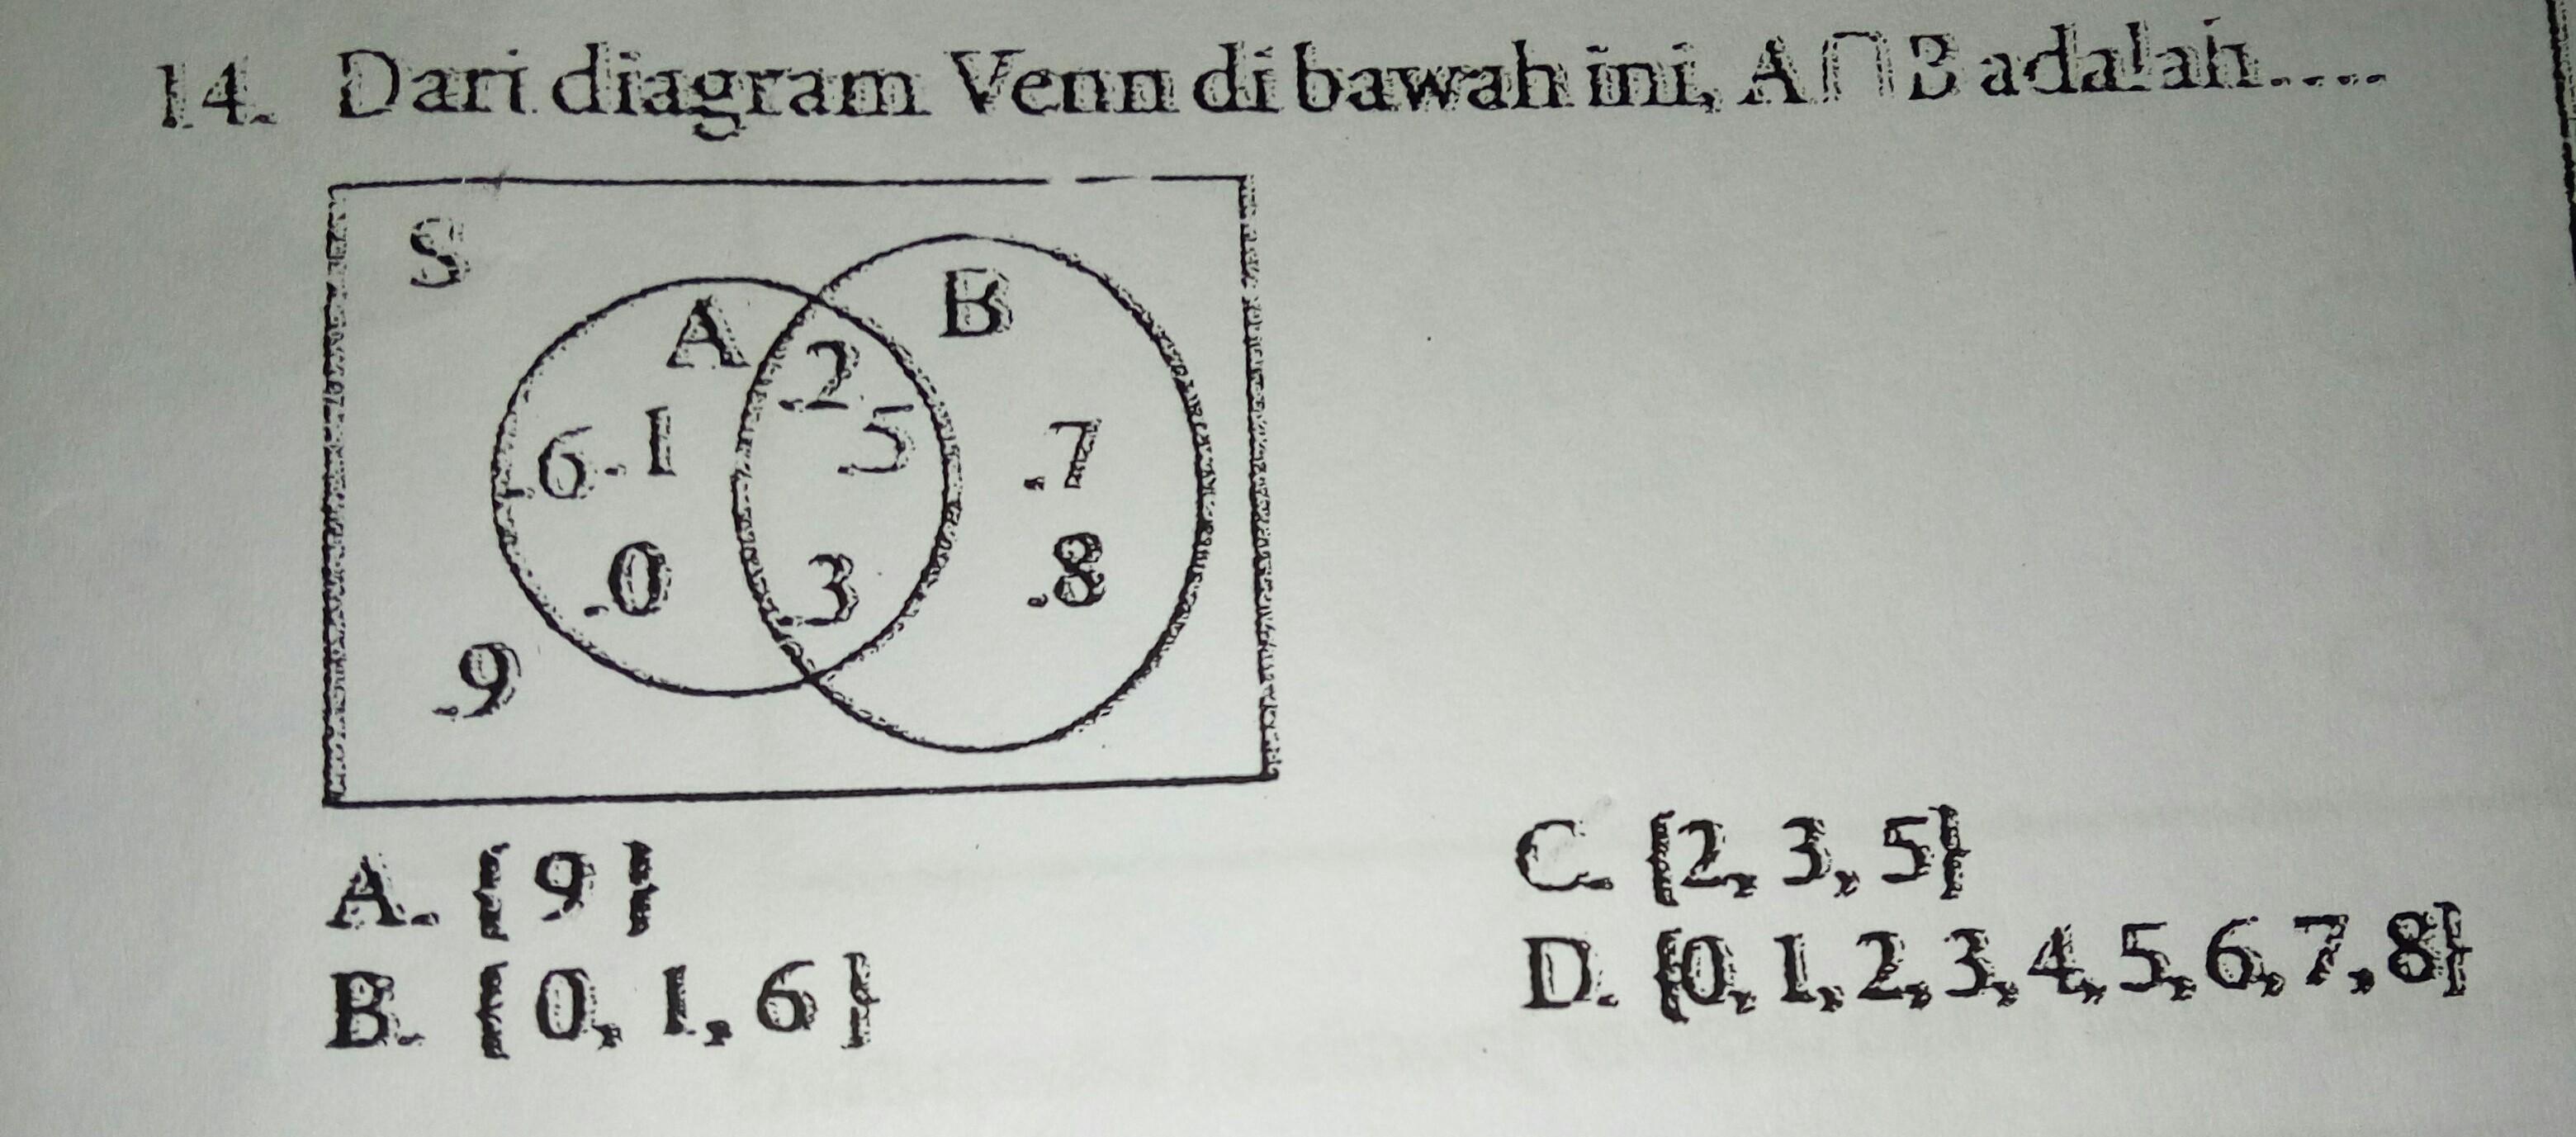 Dari diagram venn dibawah ini anb adalah brainly dari diagram venn dibawah ini anb adalah ccuart Gallery